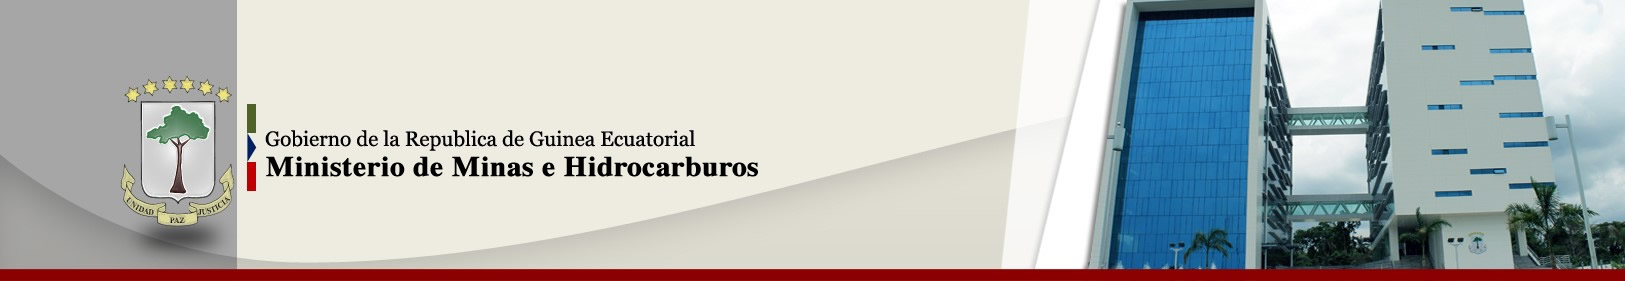 Ministerio de Minas e Hidrocarburos